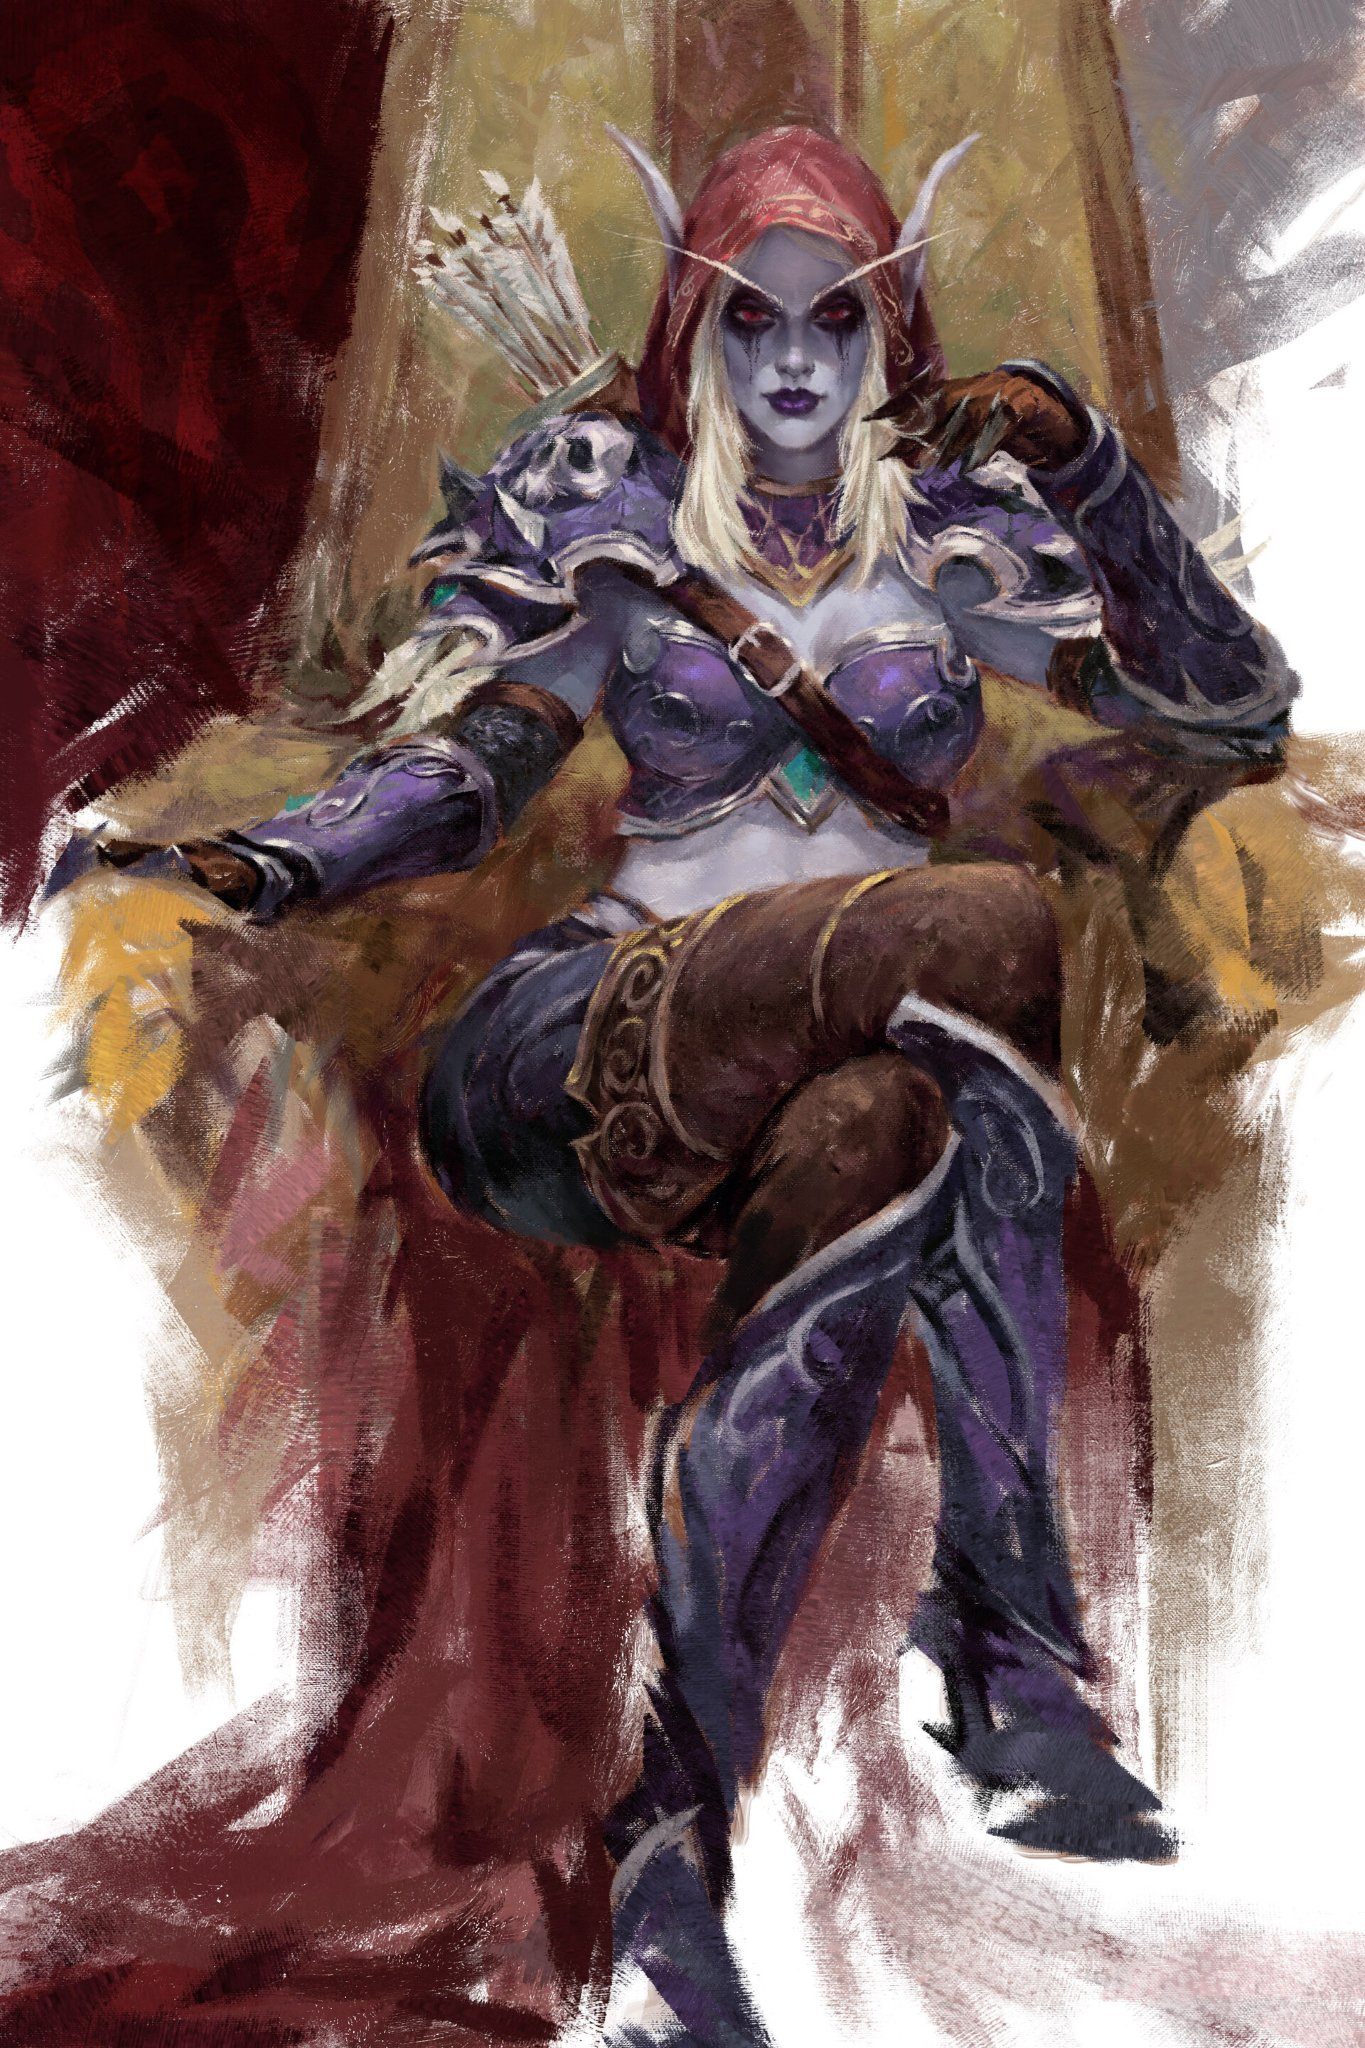 yfwJ3LsasTI.jpg - World of Warcraft